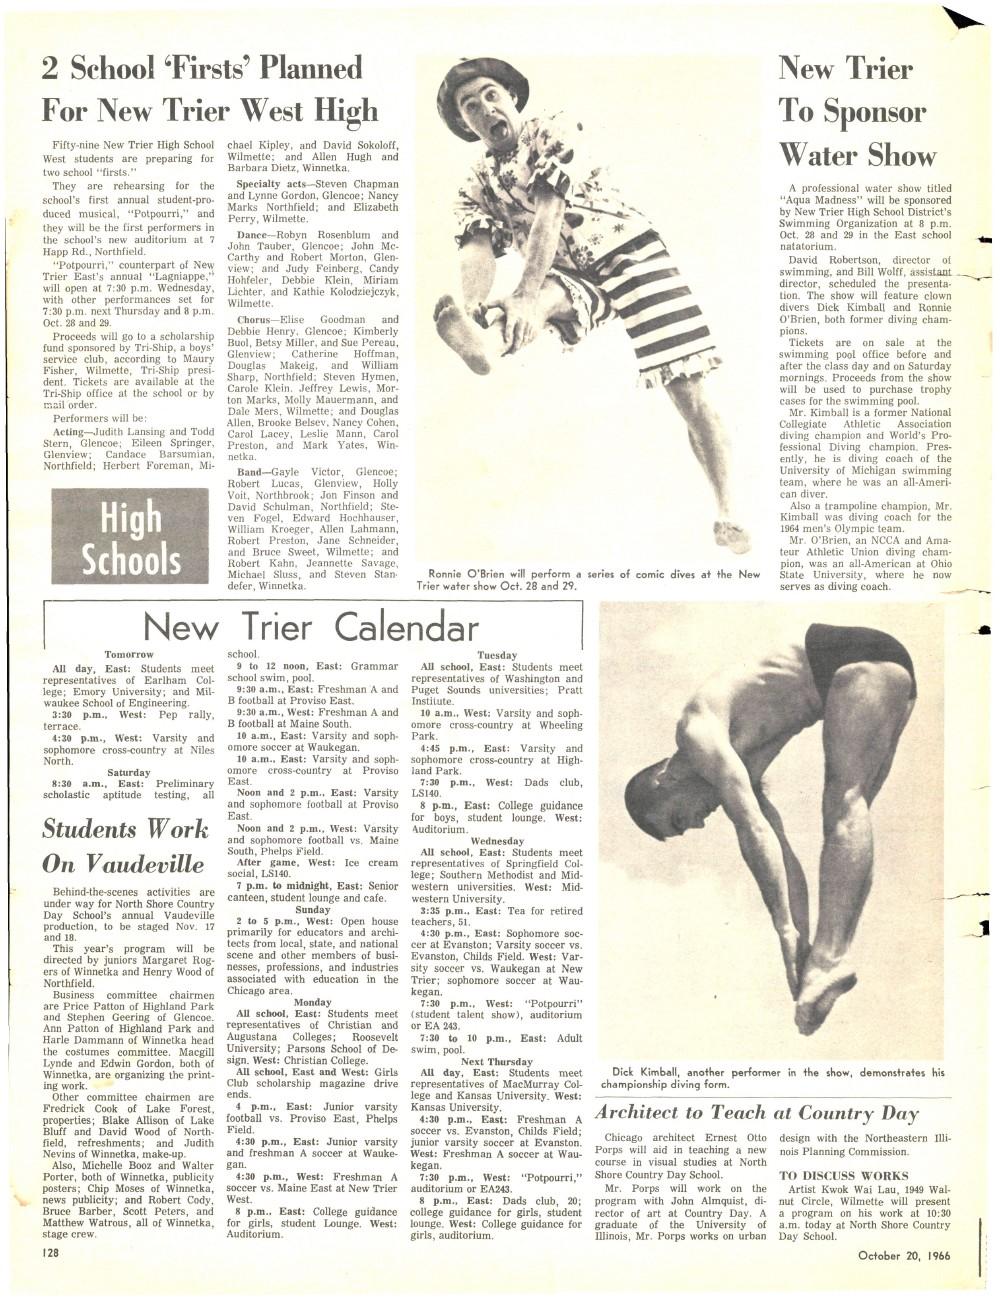 Wilmette Life (Wilmette, Illinois), 20 Oct 1966